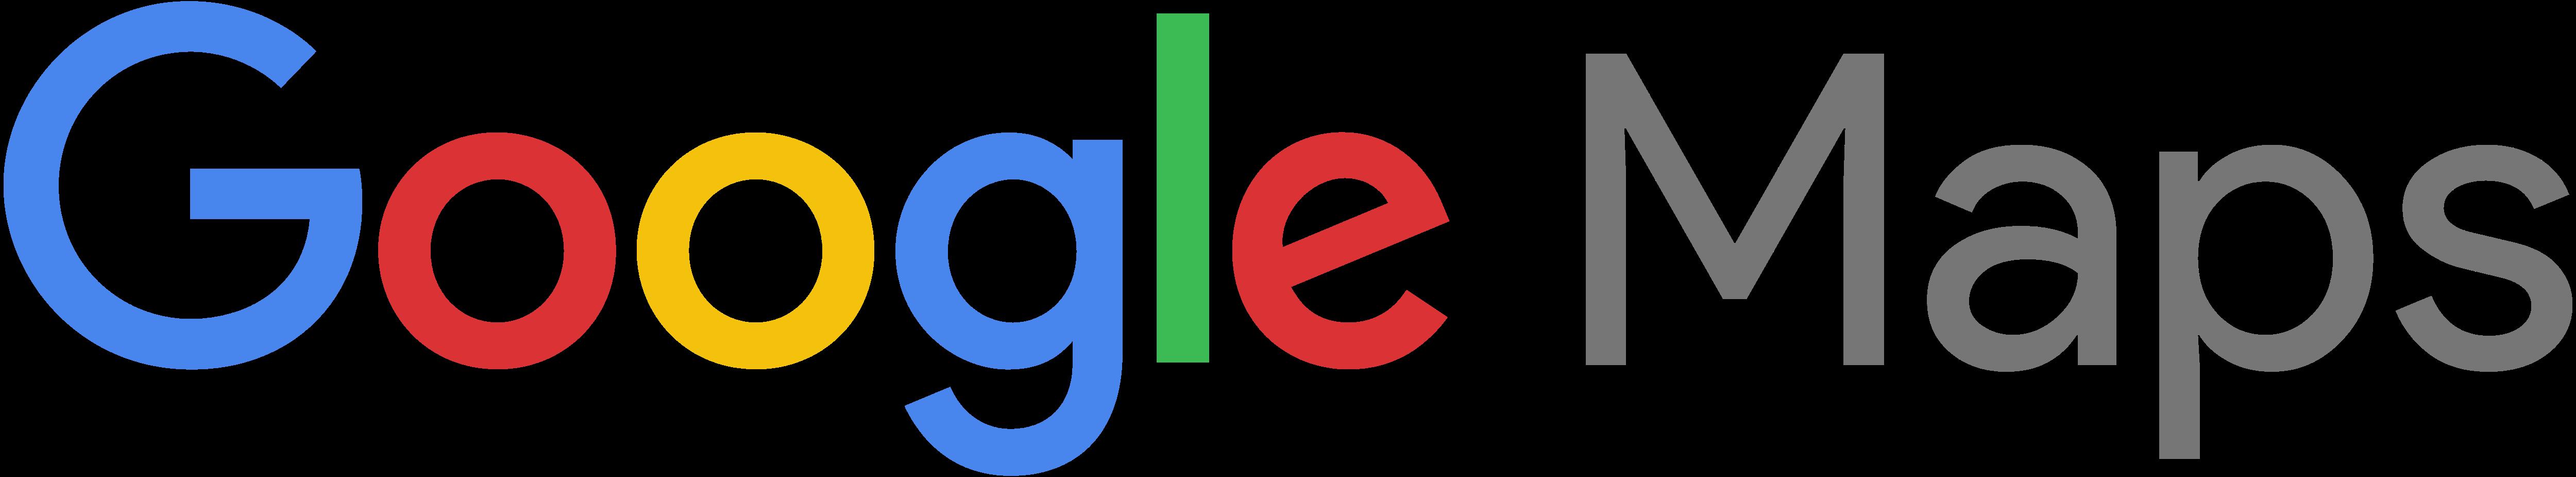 google maps – logos download - google maps logo wordmark